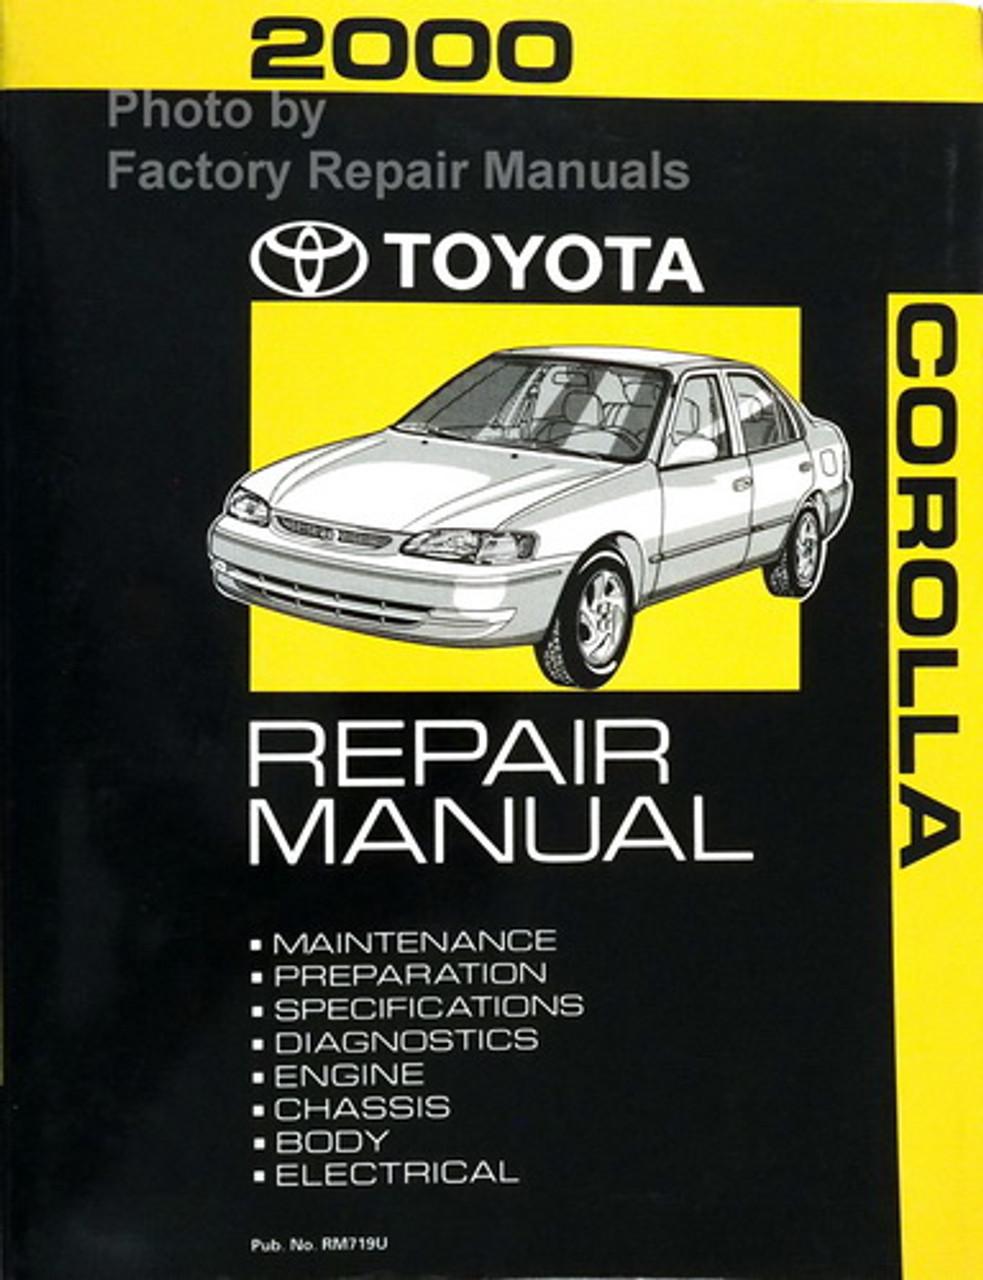 2000 Toyota Corolla Factory Service Manual Original Shop Manual Guide